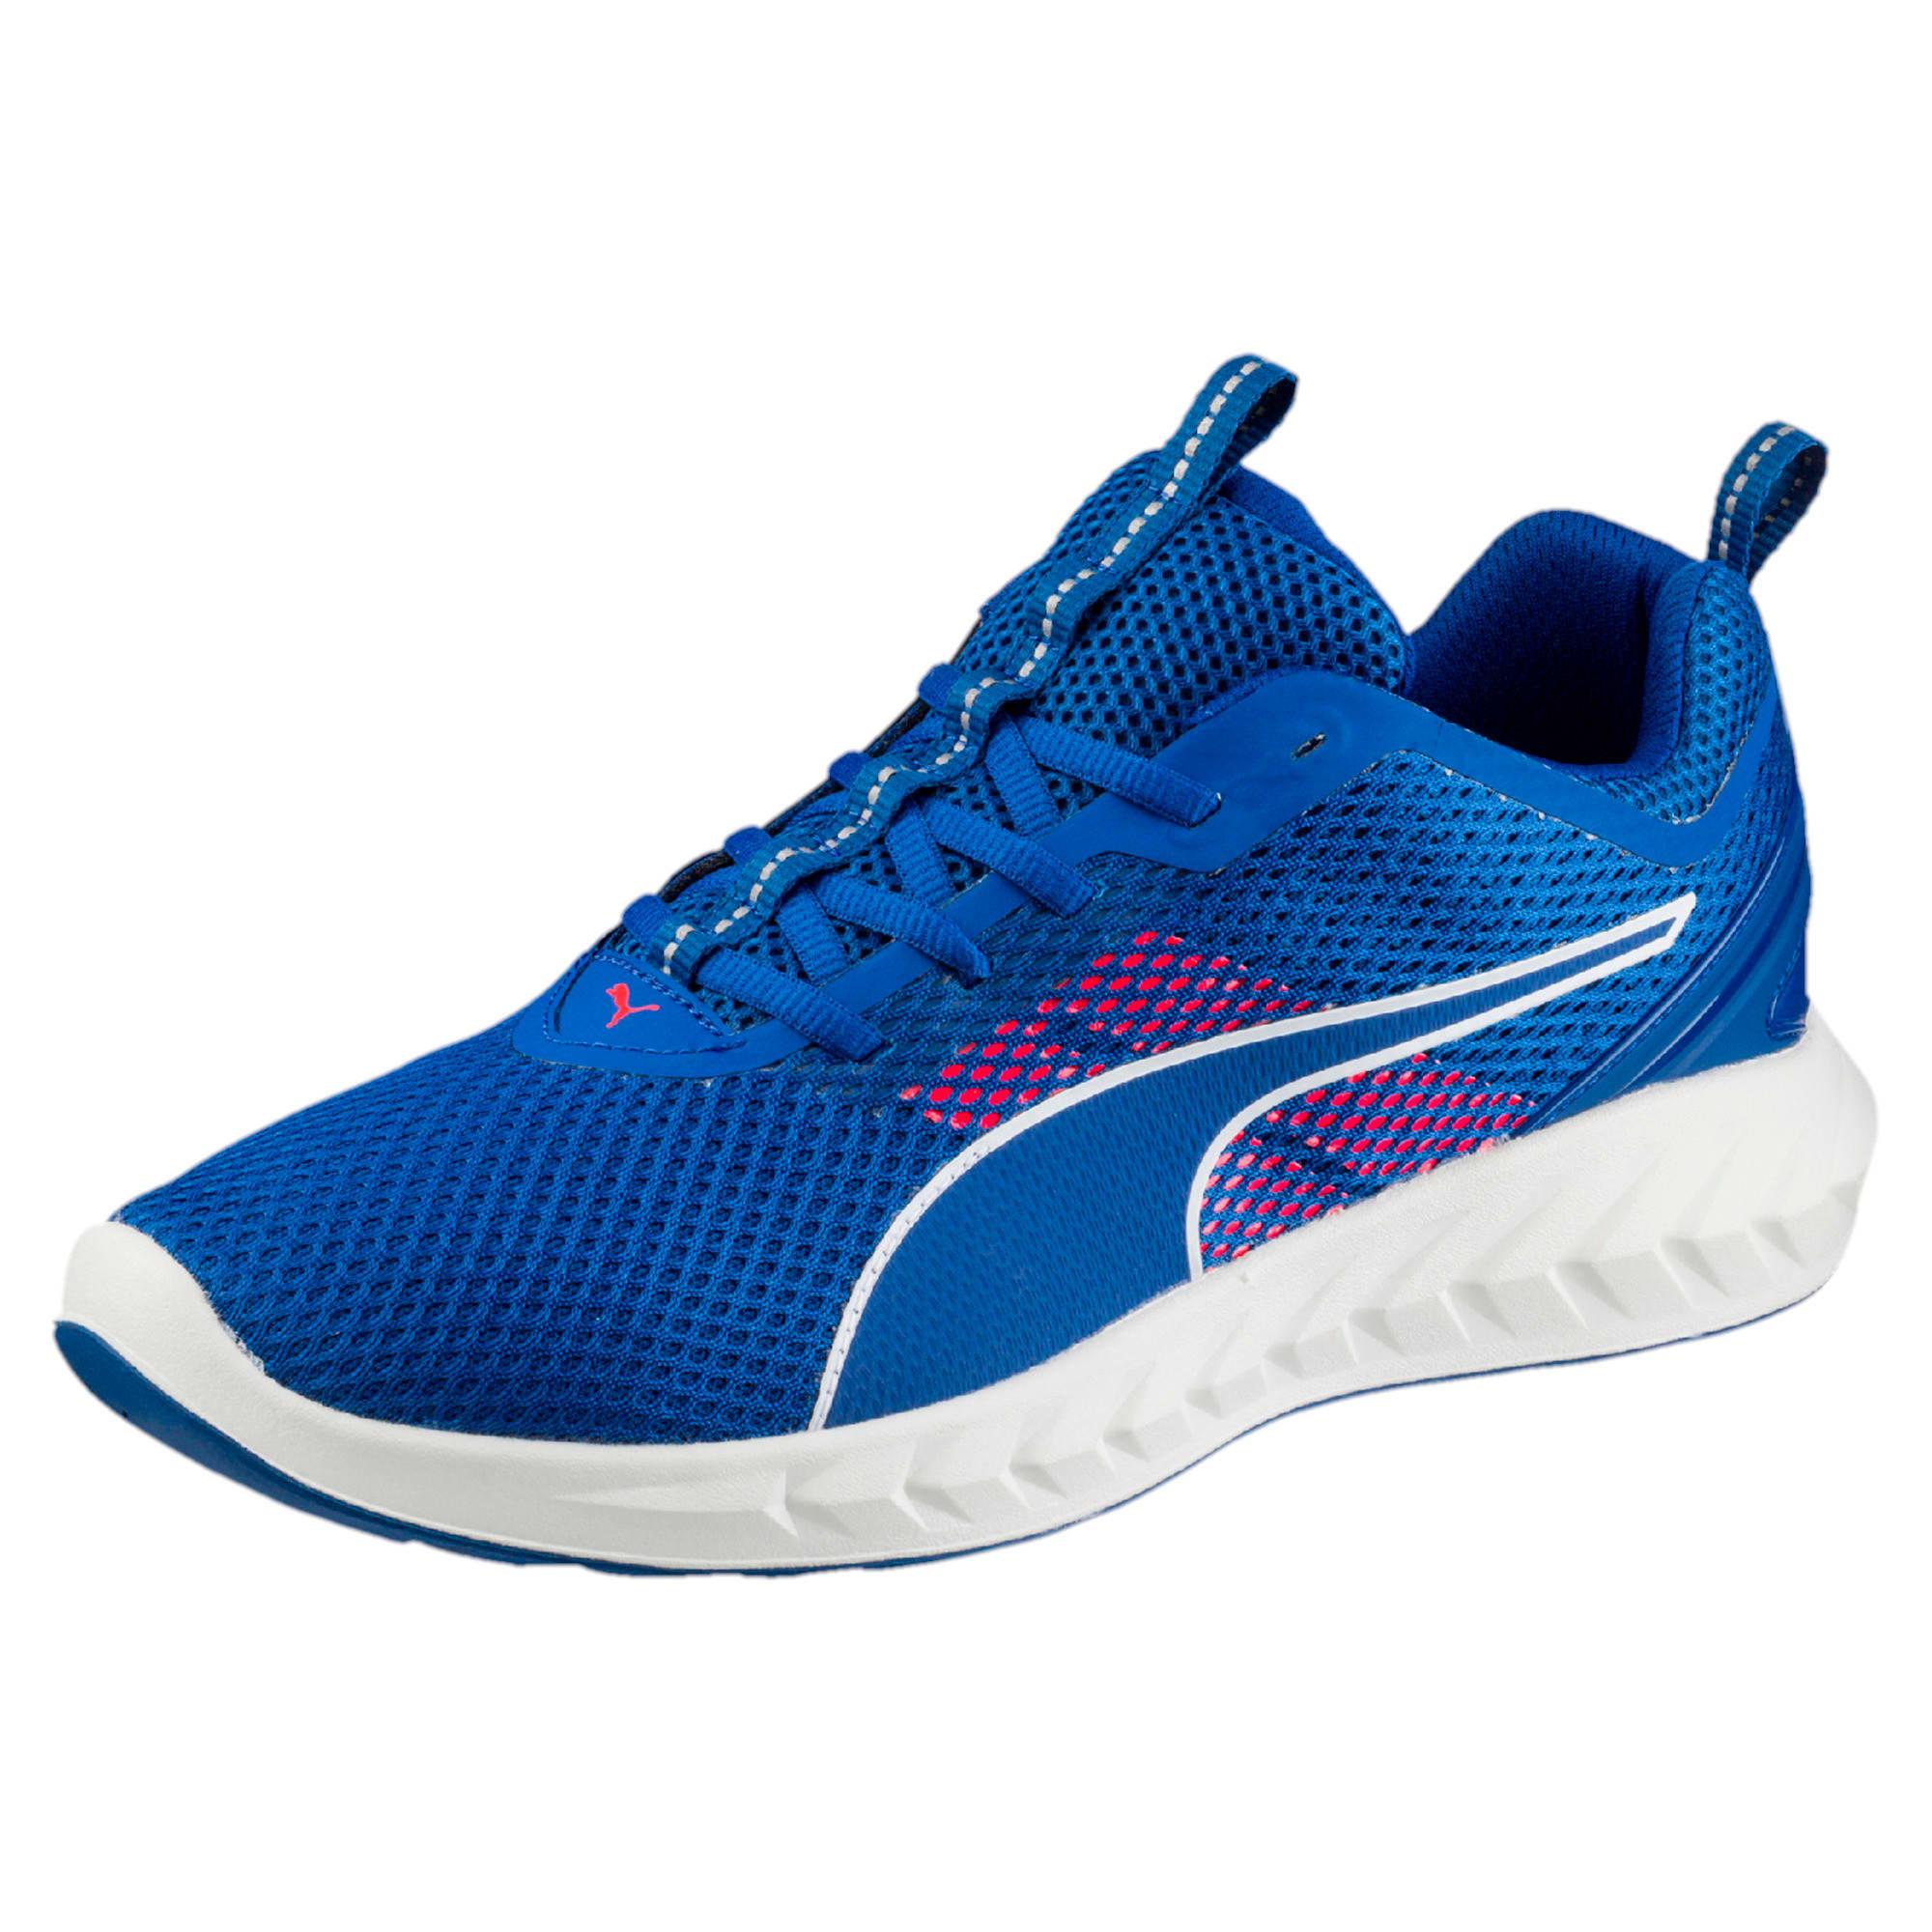 Thumbnail 1 of IGNITE Ultimate 2 Men's Running Shoes, TRUE BLUE-Bright Plasma, medium-IND